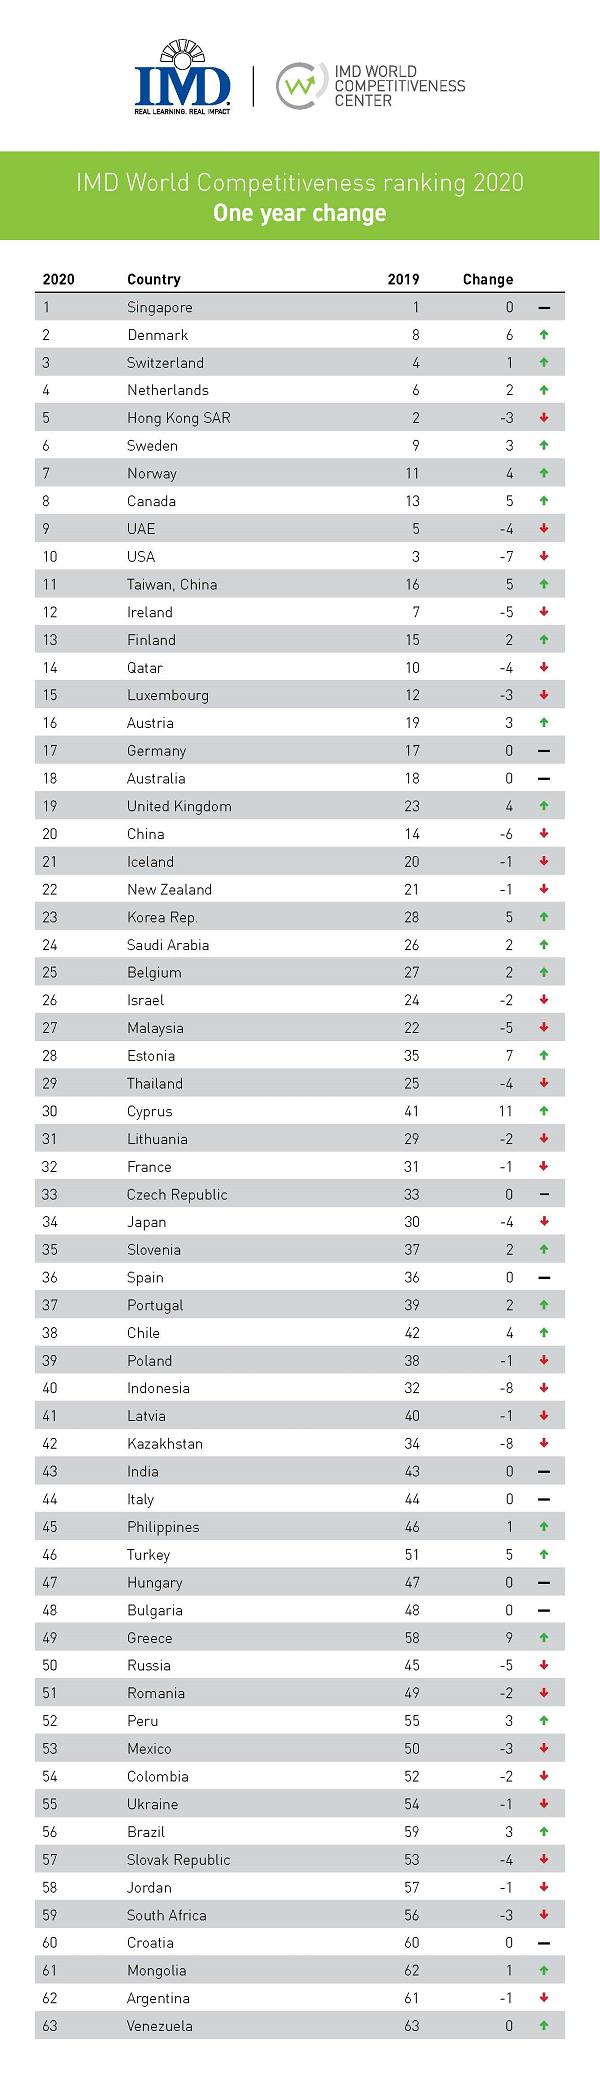 imm1 - IMD ranking20 leggibile